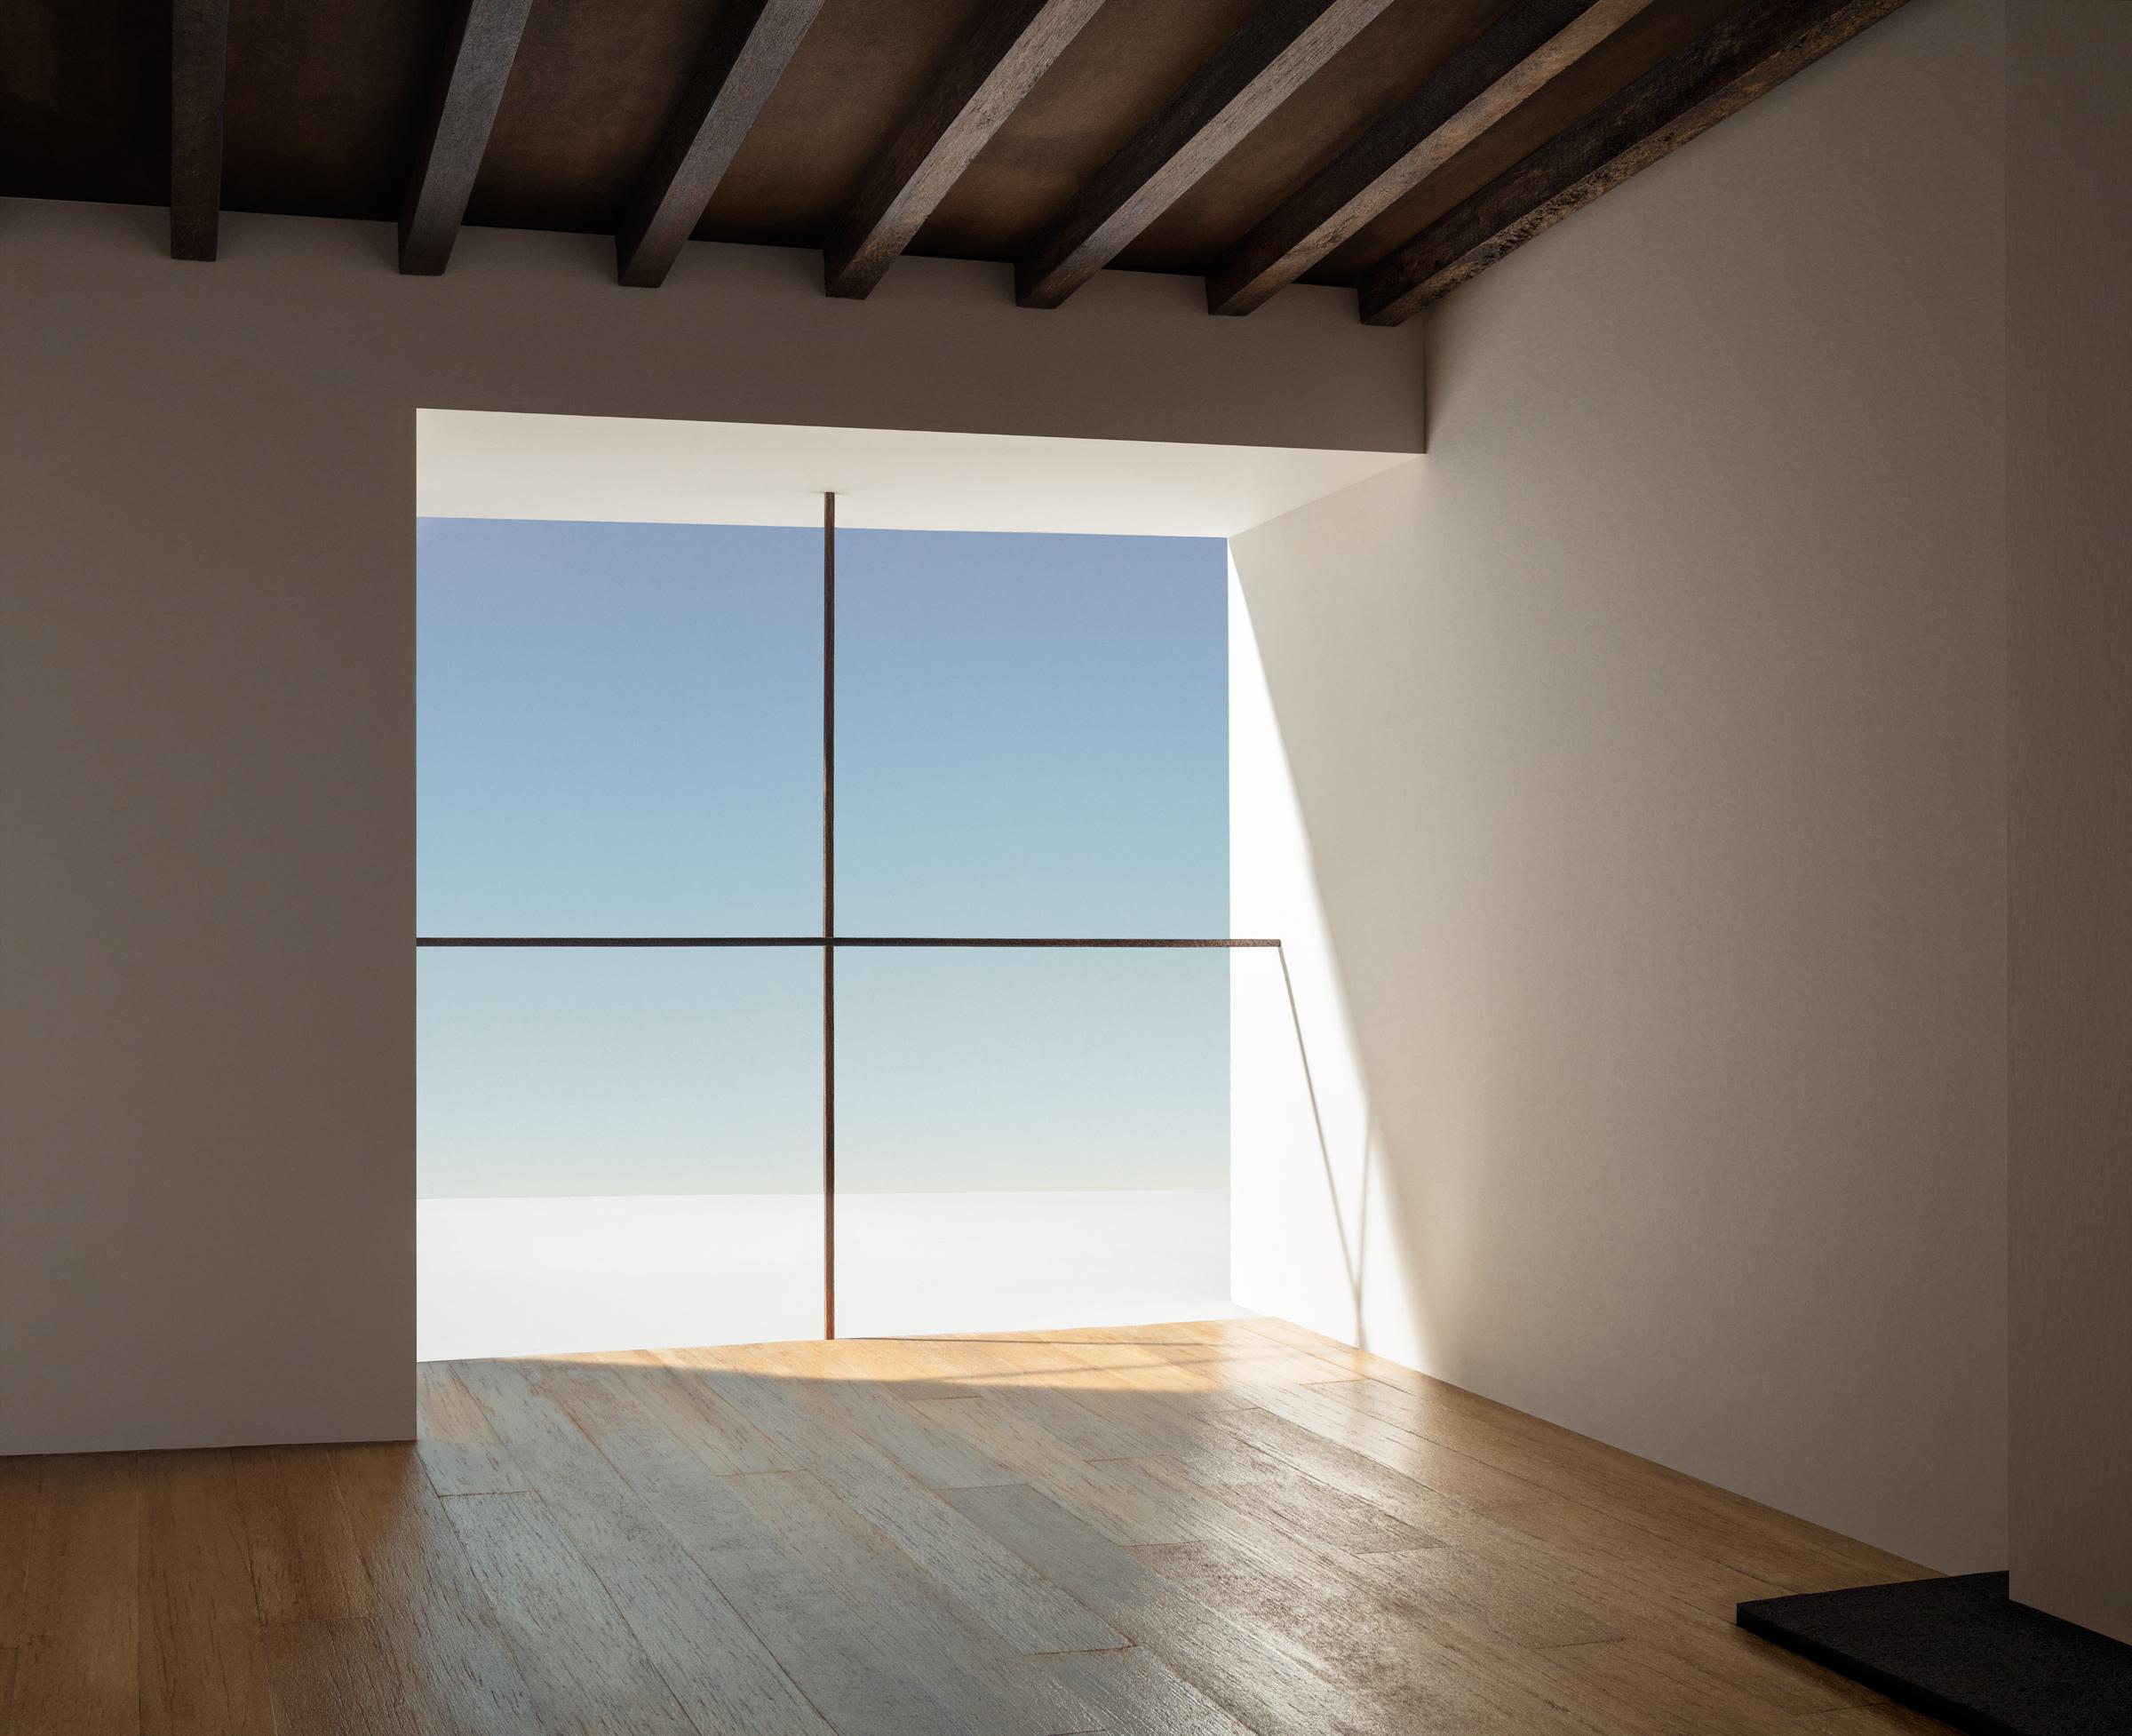 Living Room, 2017